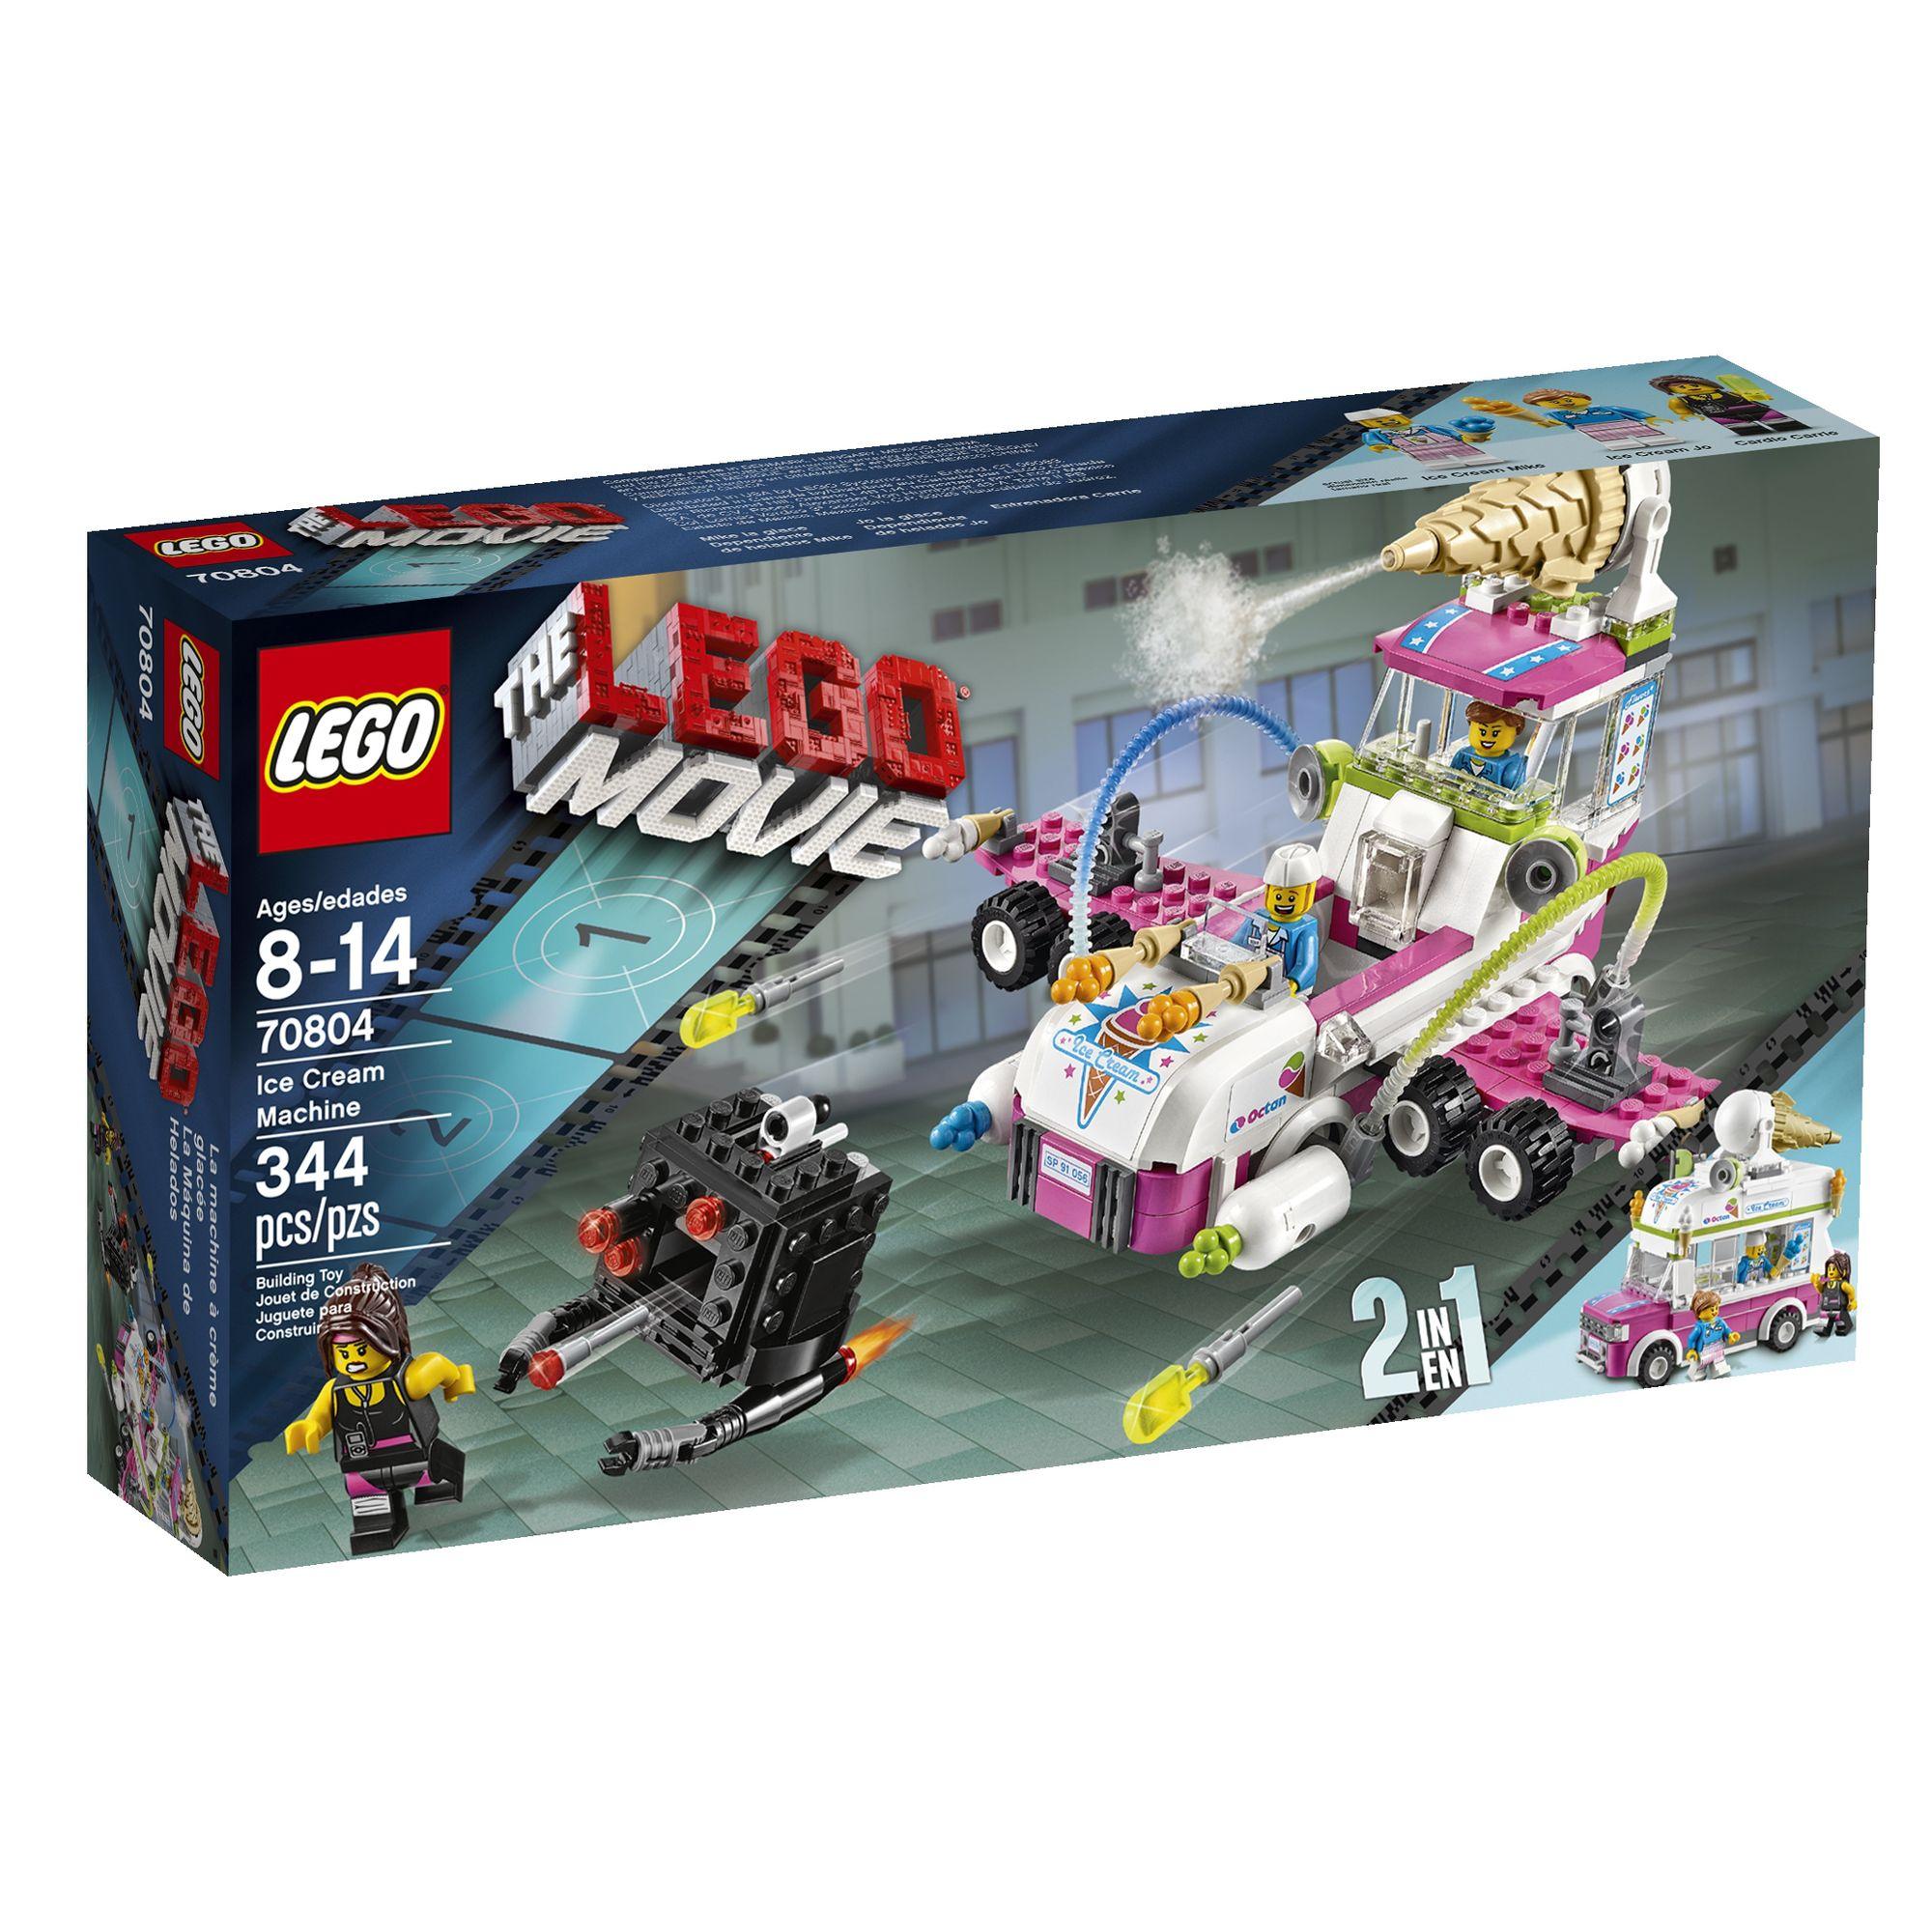 Lego Movie Toys : Ice cream machine brickipedia fandom powered by